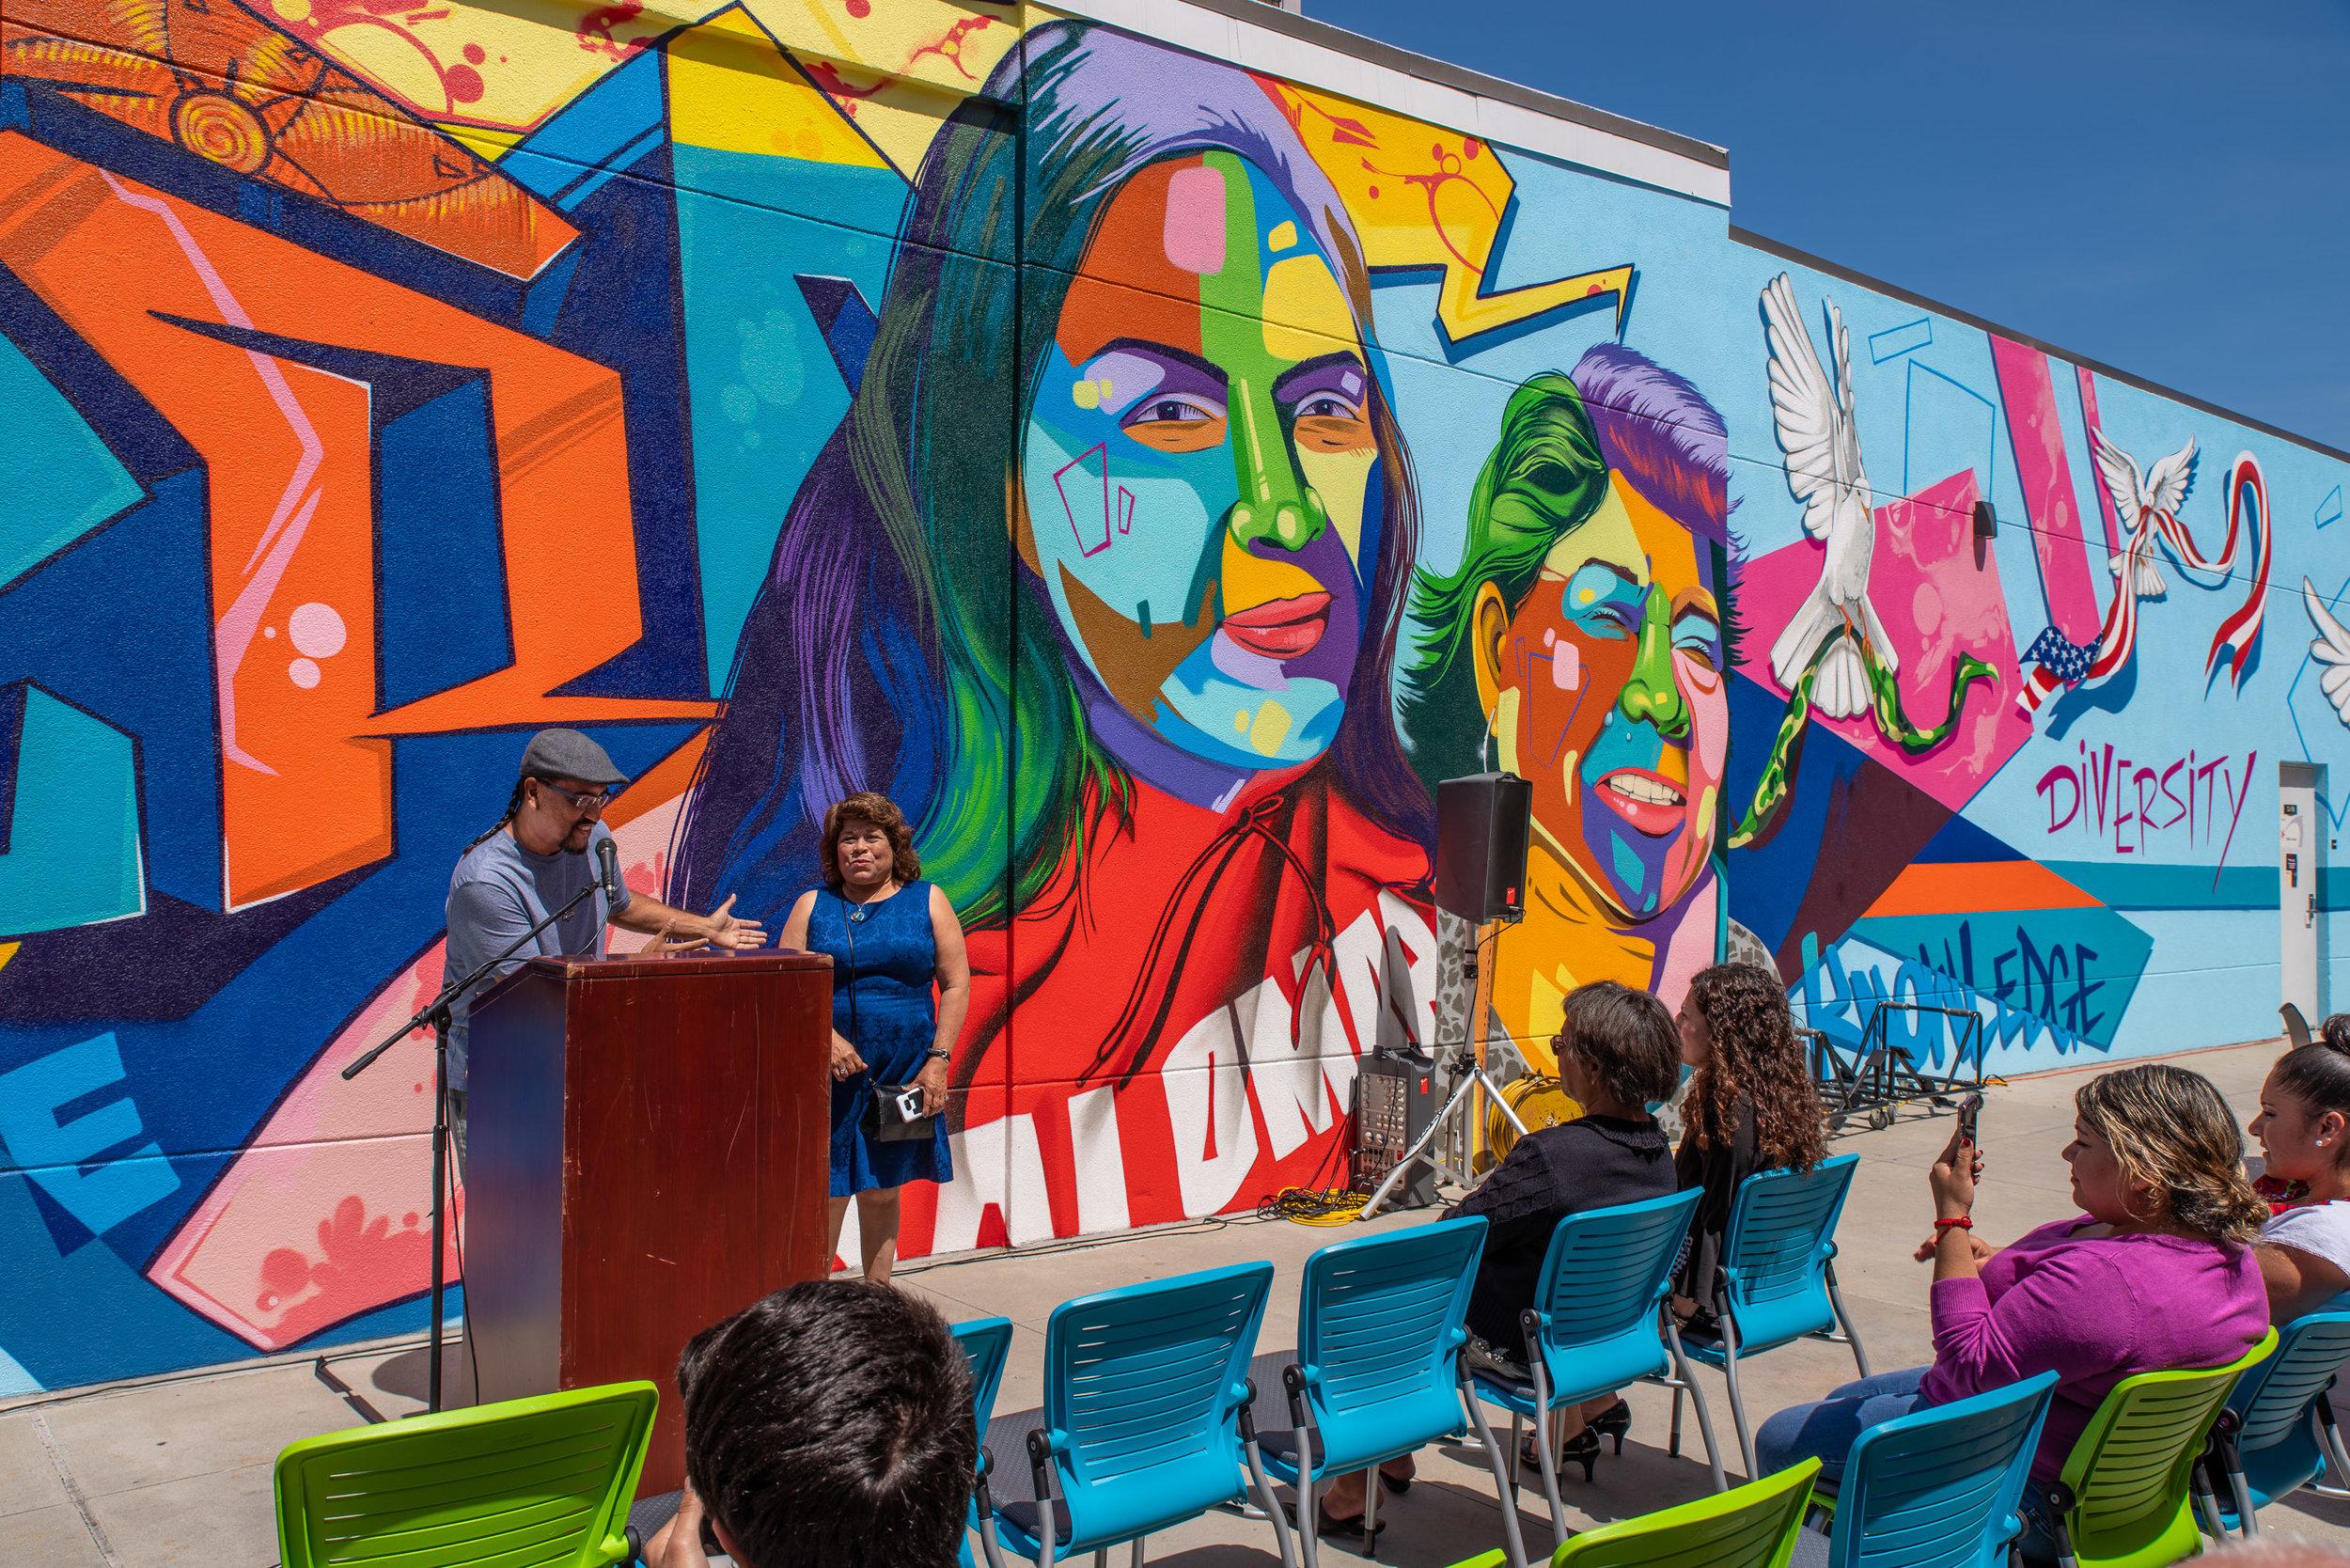 2019-05-14-man-one-mural-k-1-imgp2425_46948650825_o.jpg